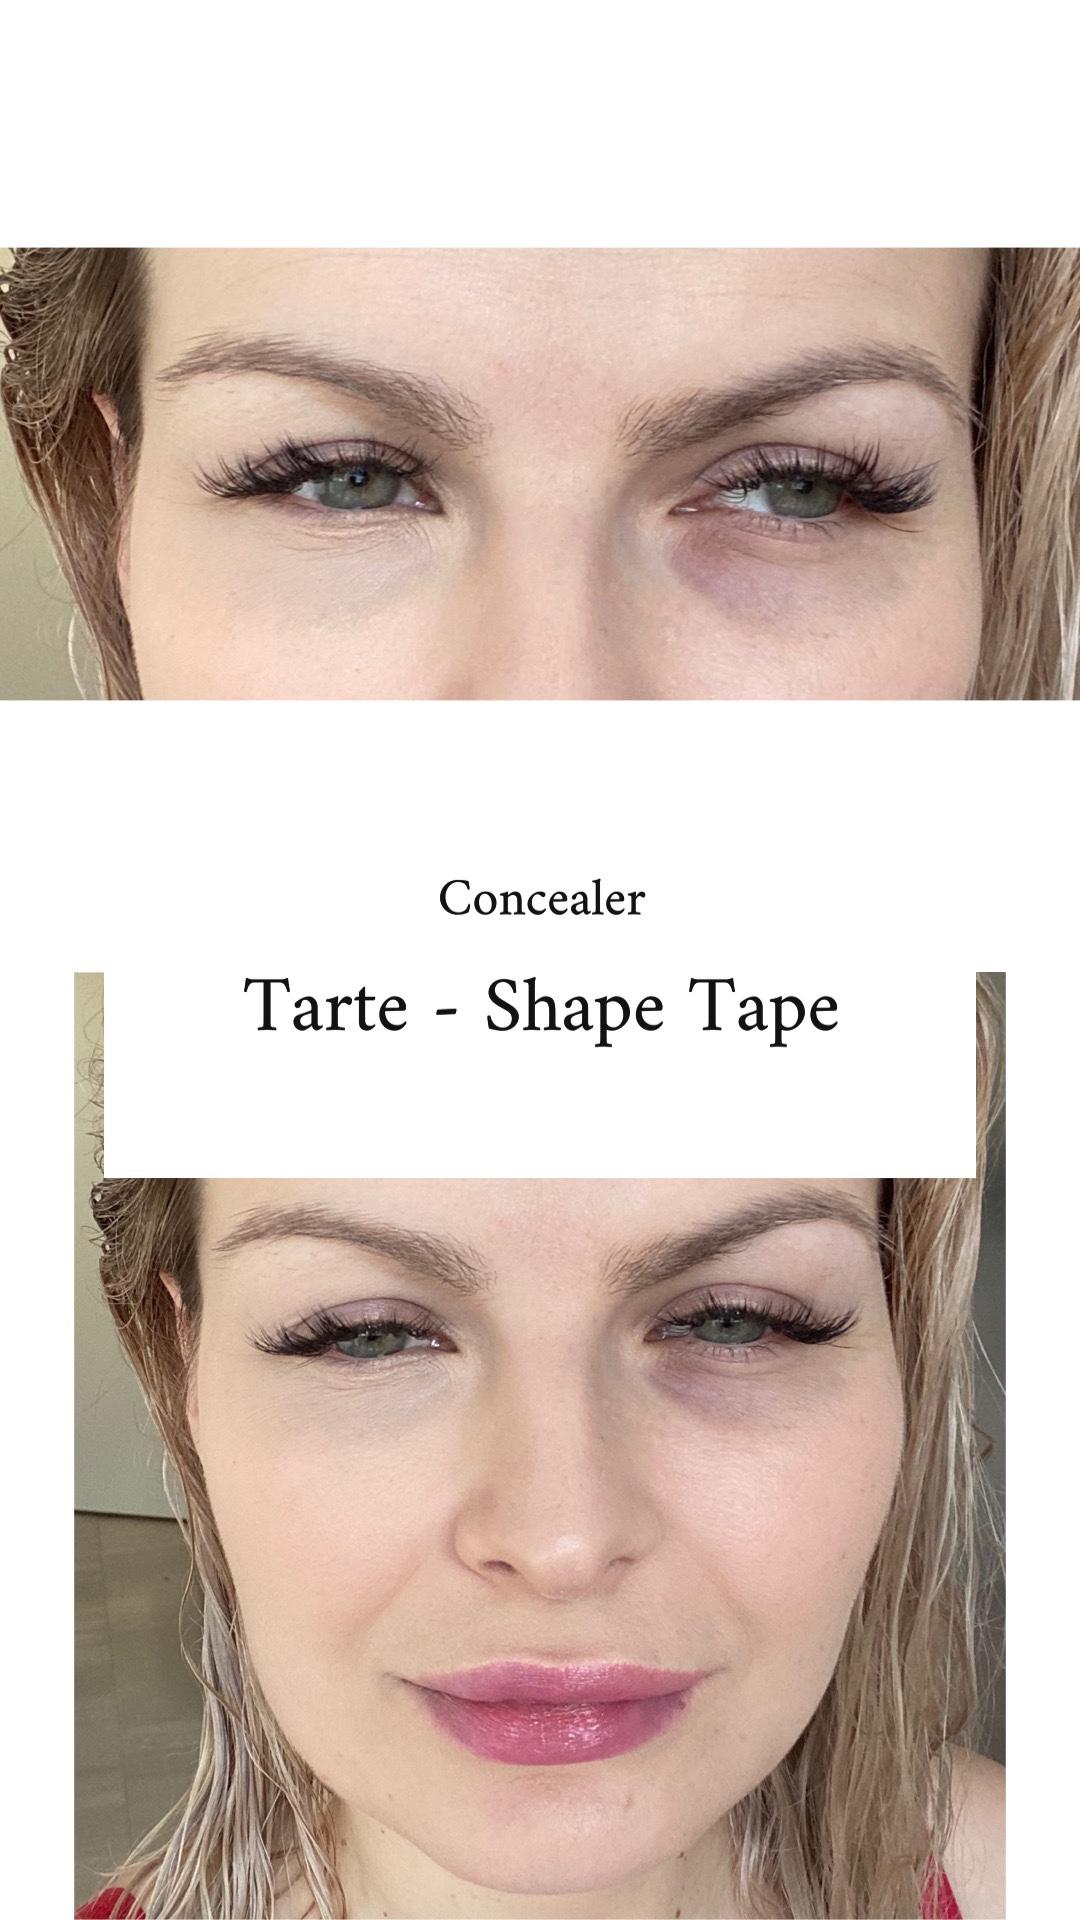 Bästa concealer - Tarte, Shape Tape